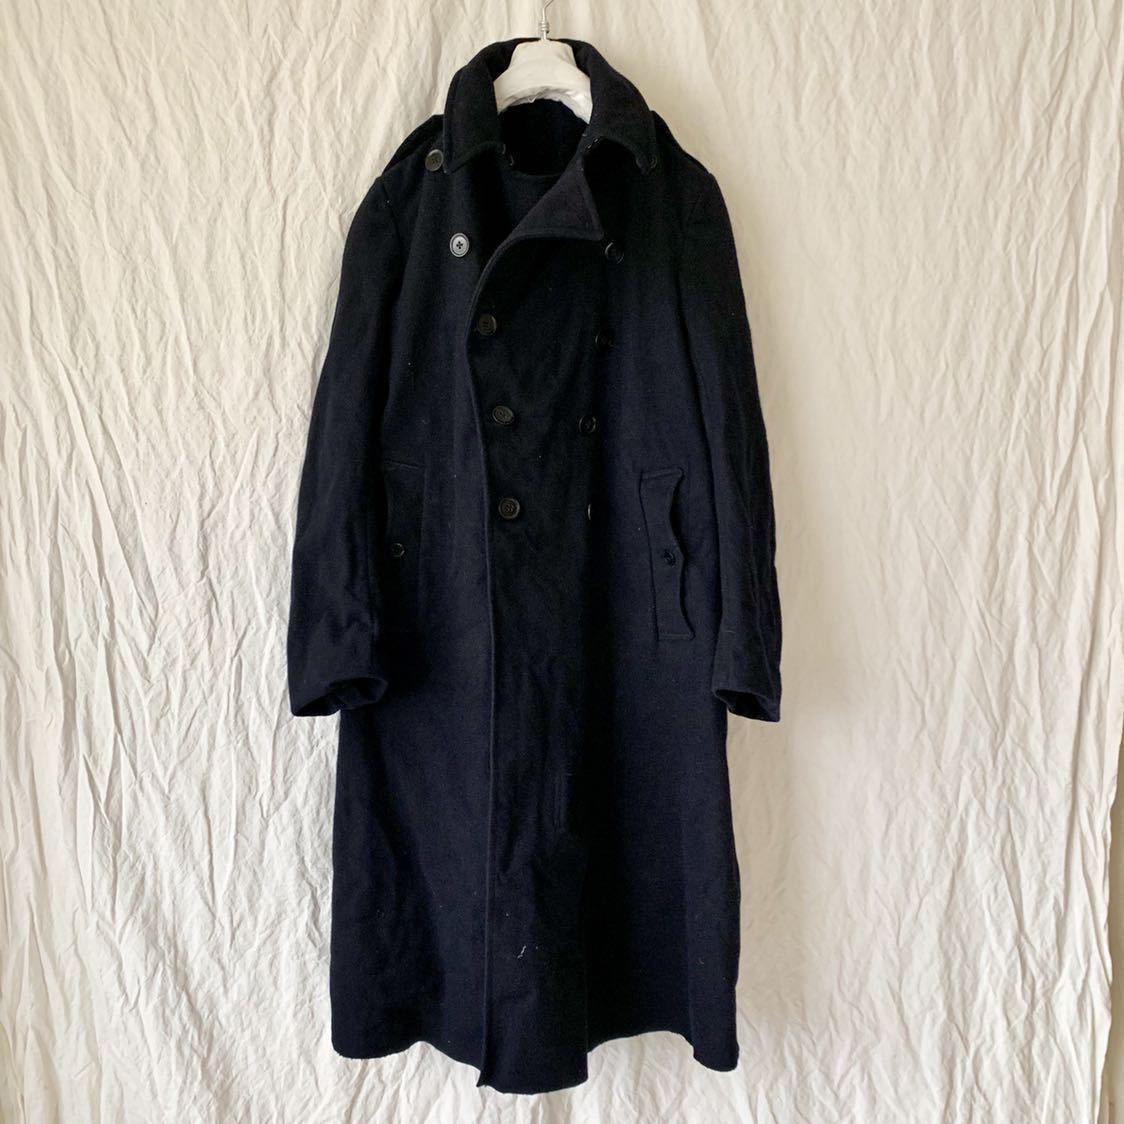 40s 50s イギリス ビンテージ ヘビーメルトン ファイヤーマン コート ウール ワーク 濃紺 ピーコート ダッフル